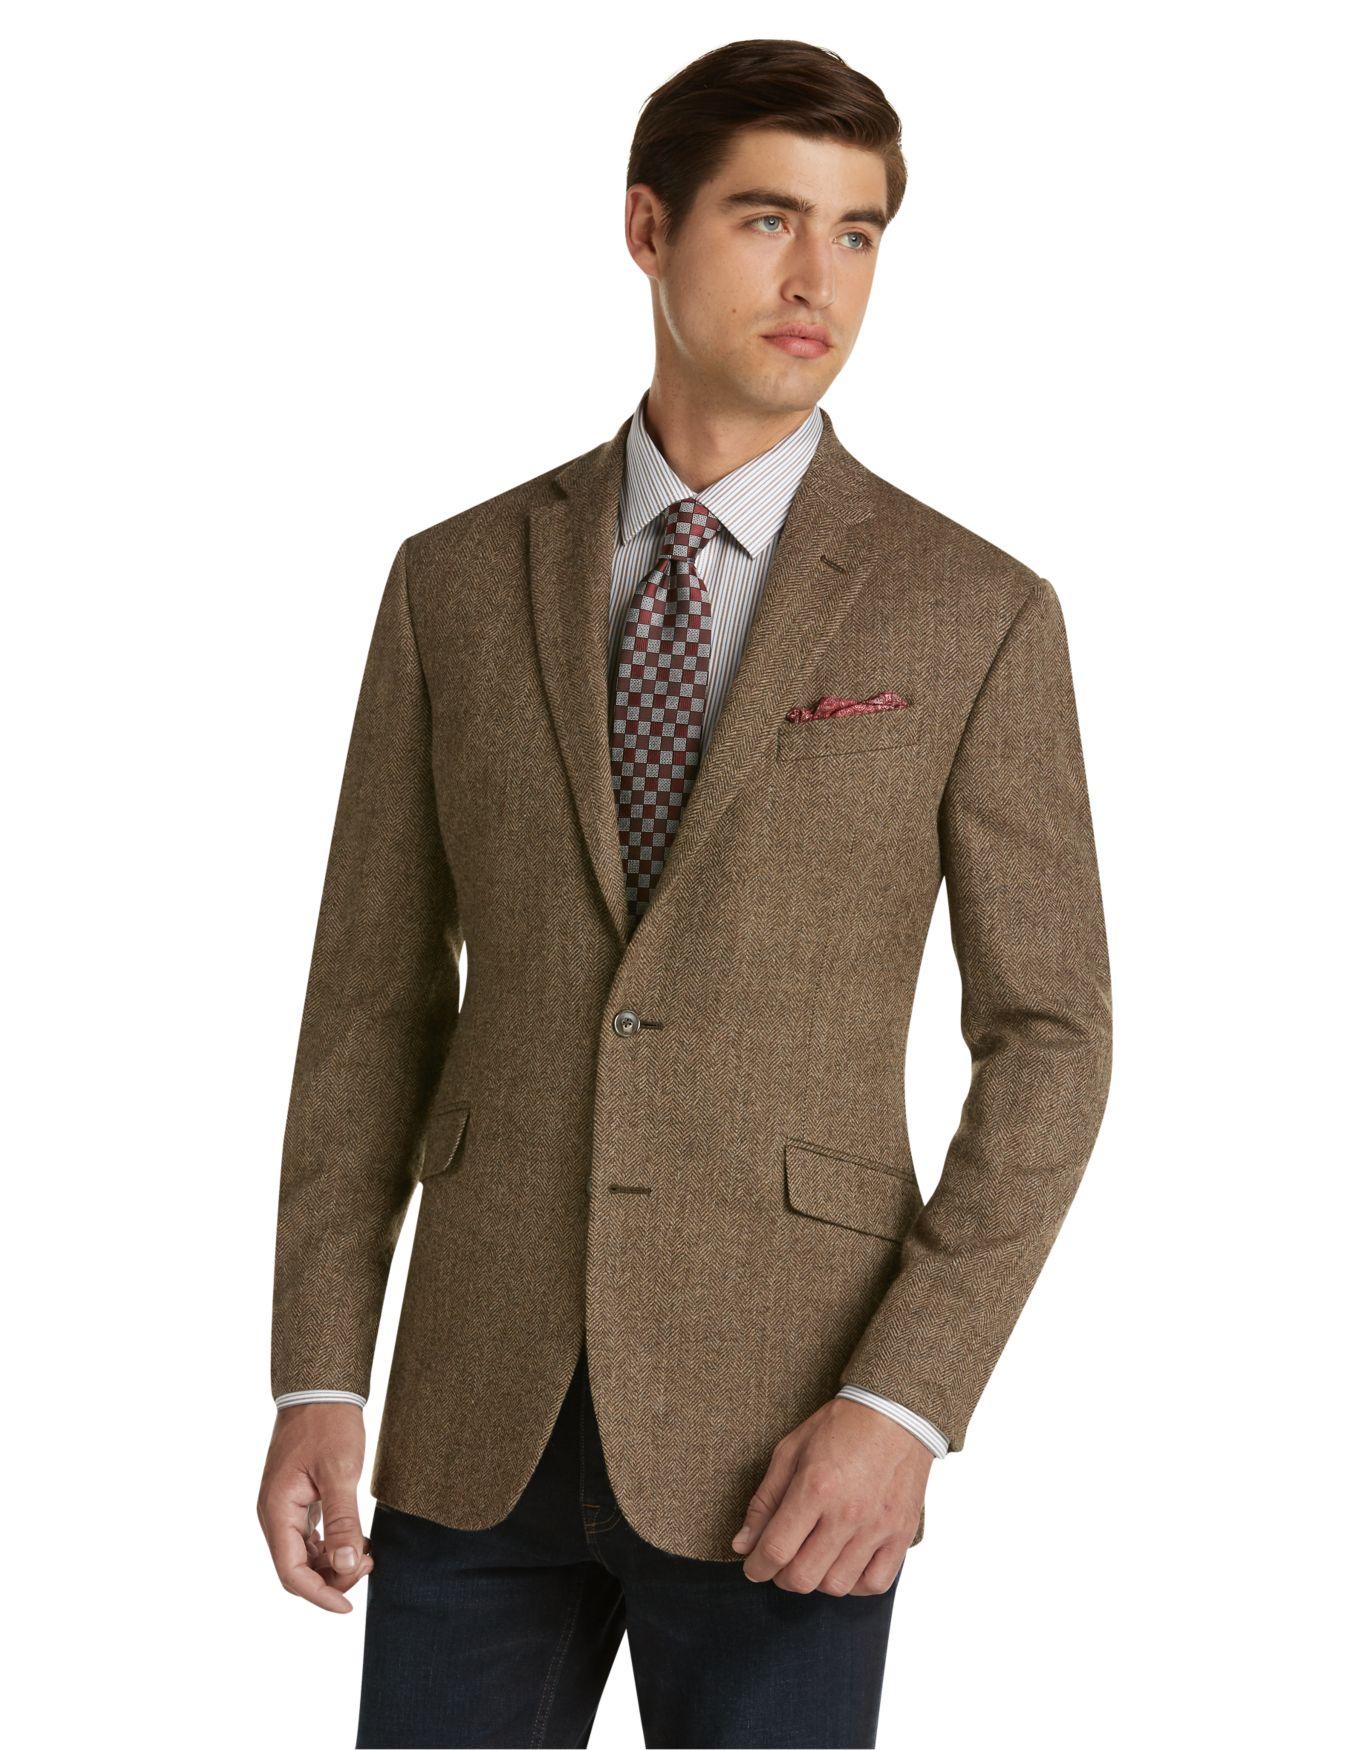 Tailored Fit Herringbone Sportcoat - Men's Sportcoats | JoS. A. Bank